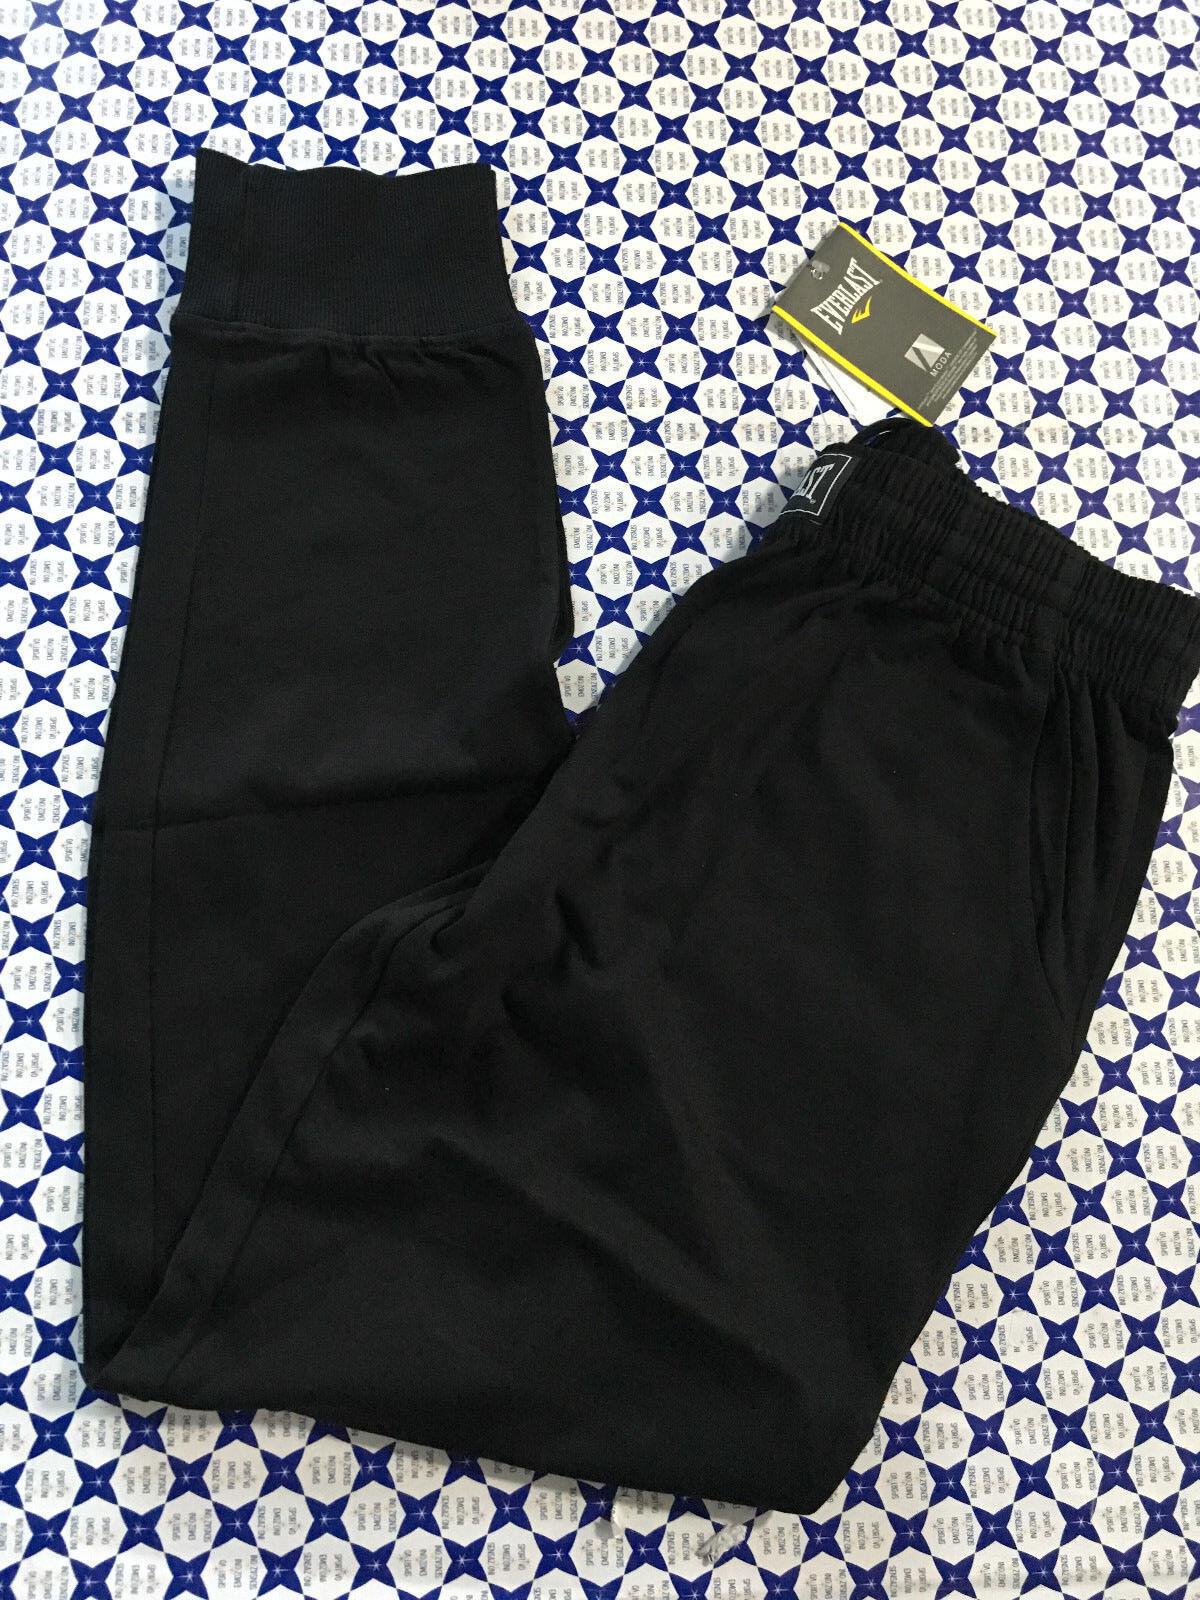 Pantalone Everlast Cotone  Herren - 4 Tasche Polsino Russel - Nero - 23M142J